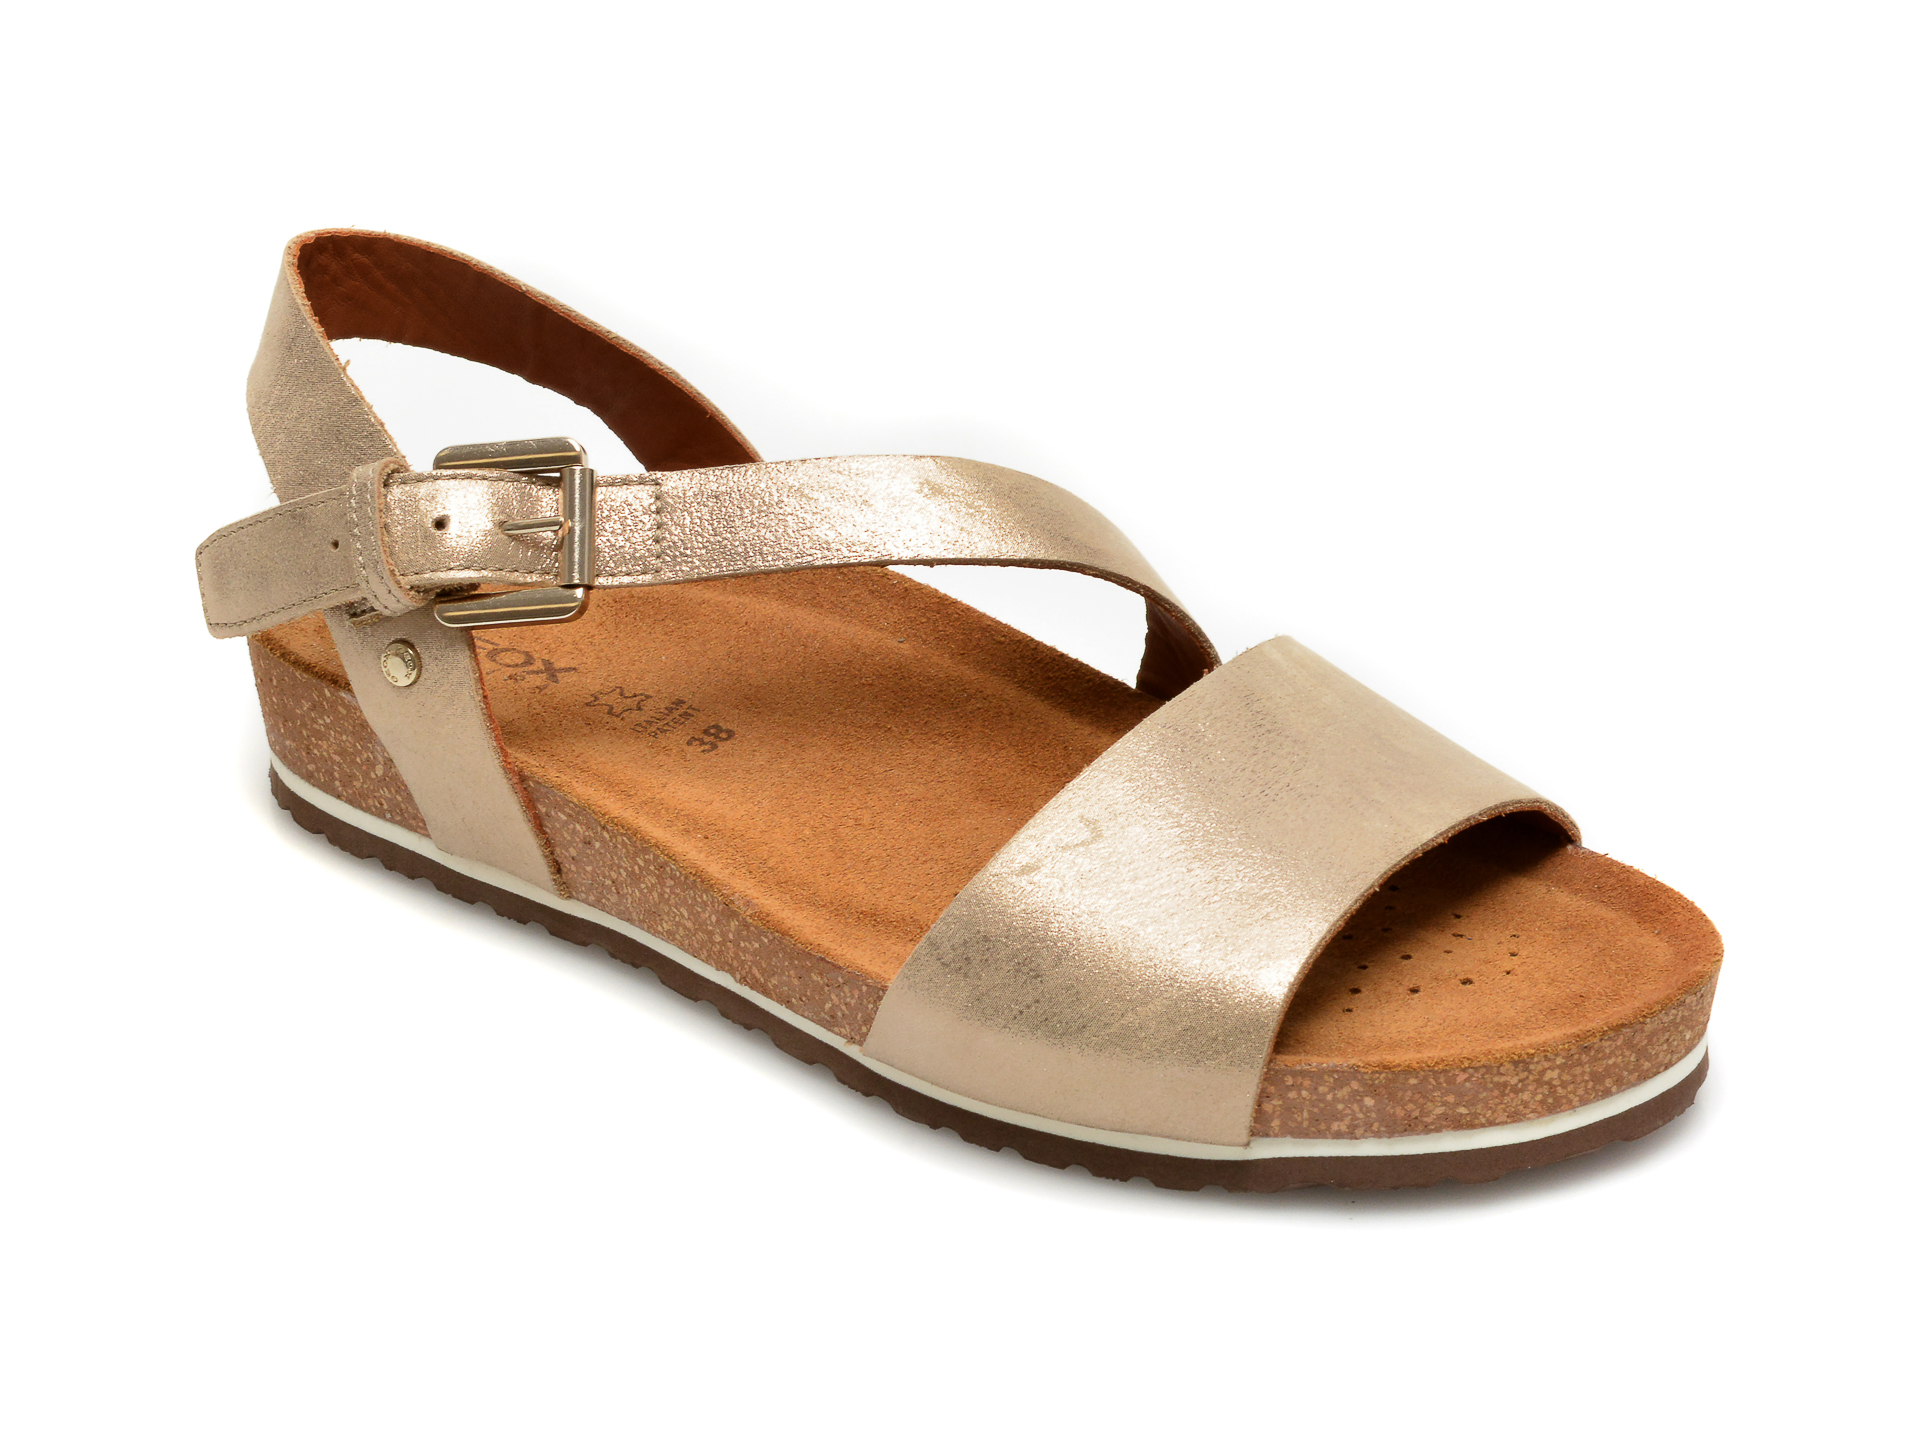 Sandale GEOX aurii, D02LUB, din piele naturala